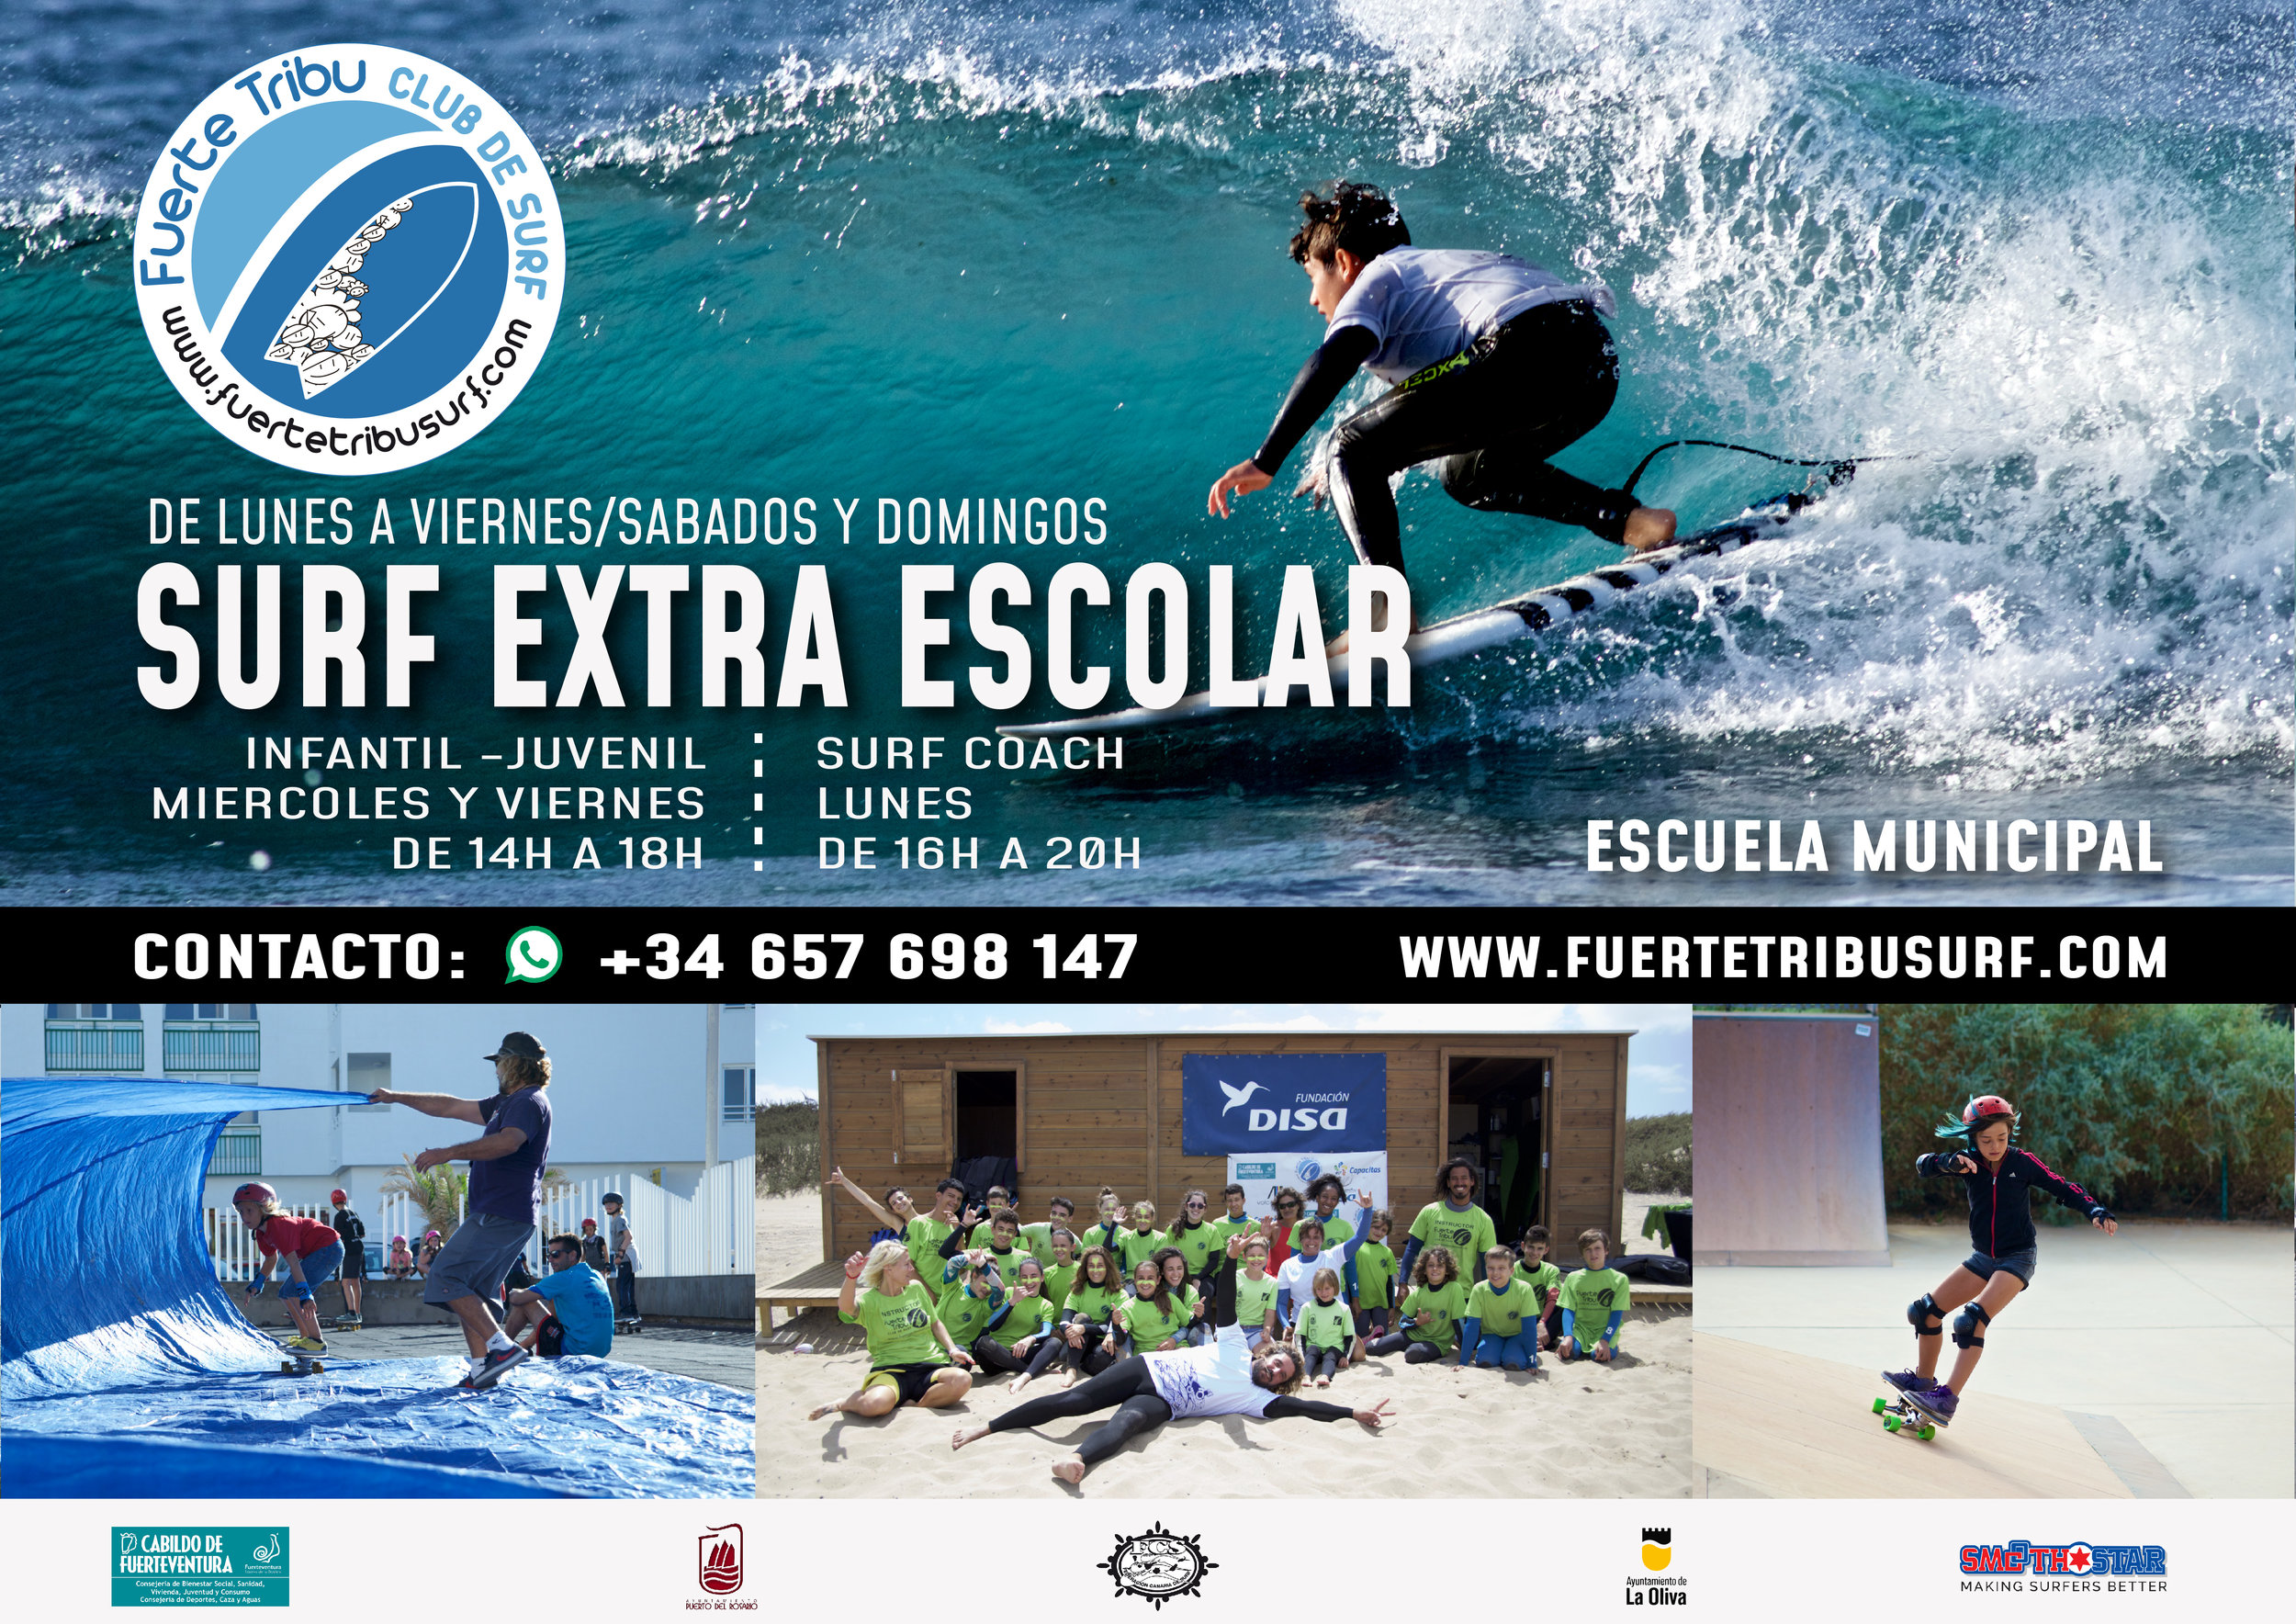 EXTRAESCOLAR2018-01.jpg